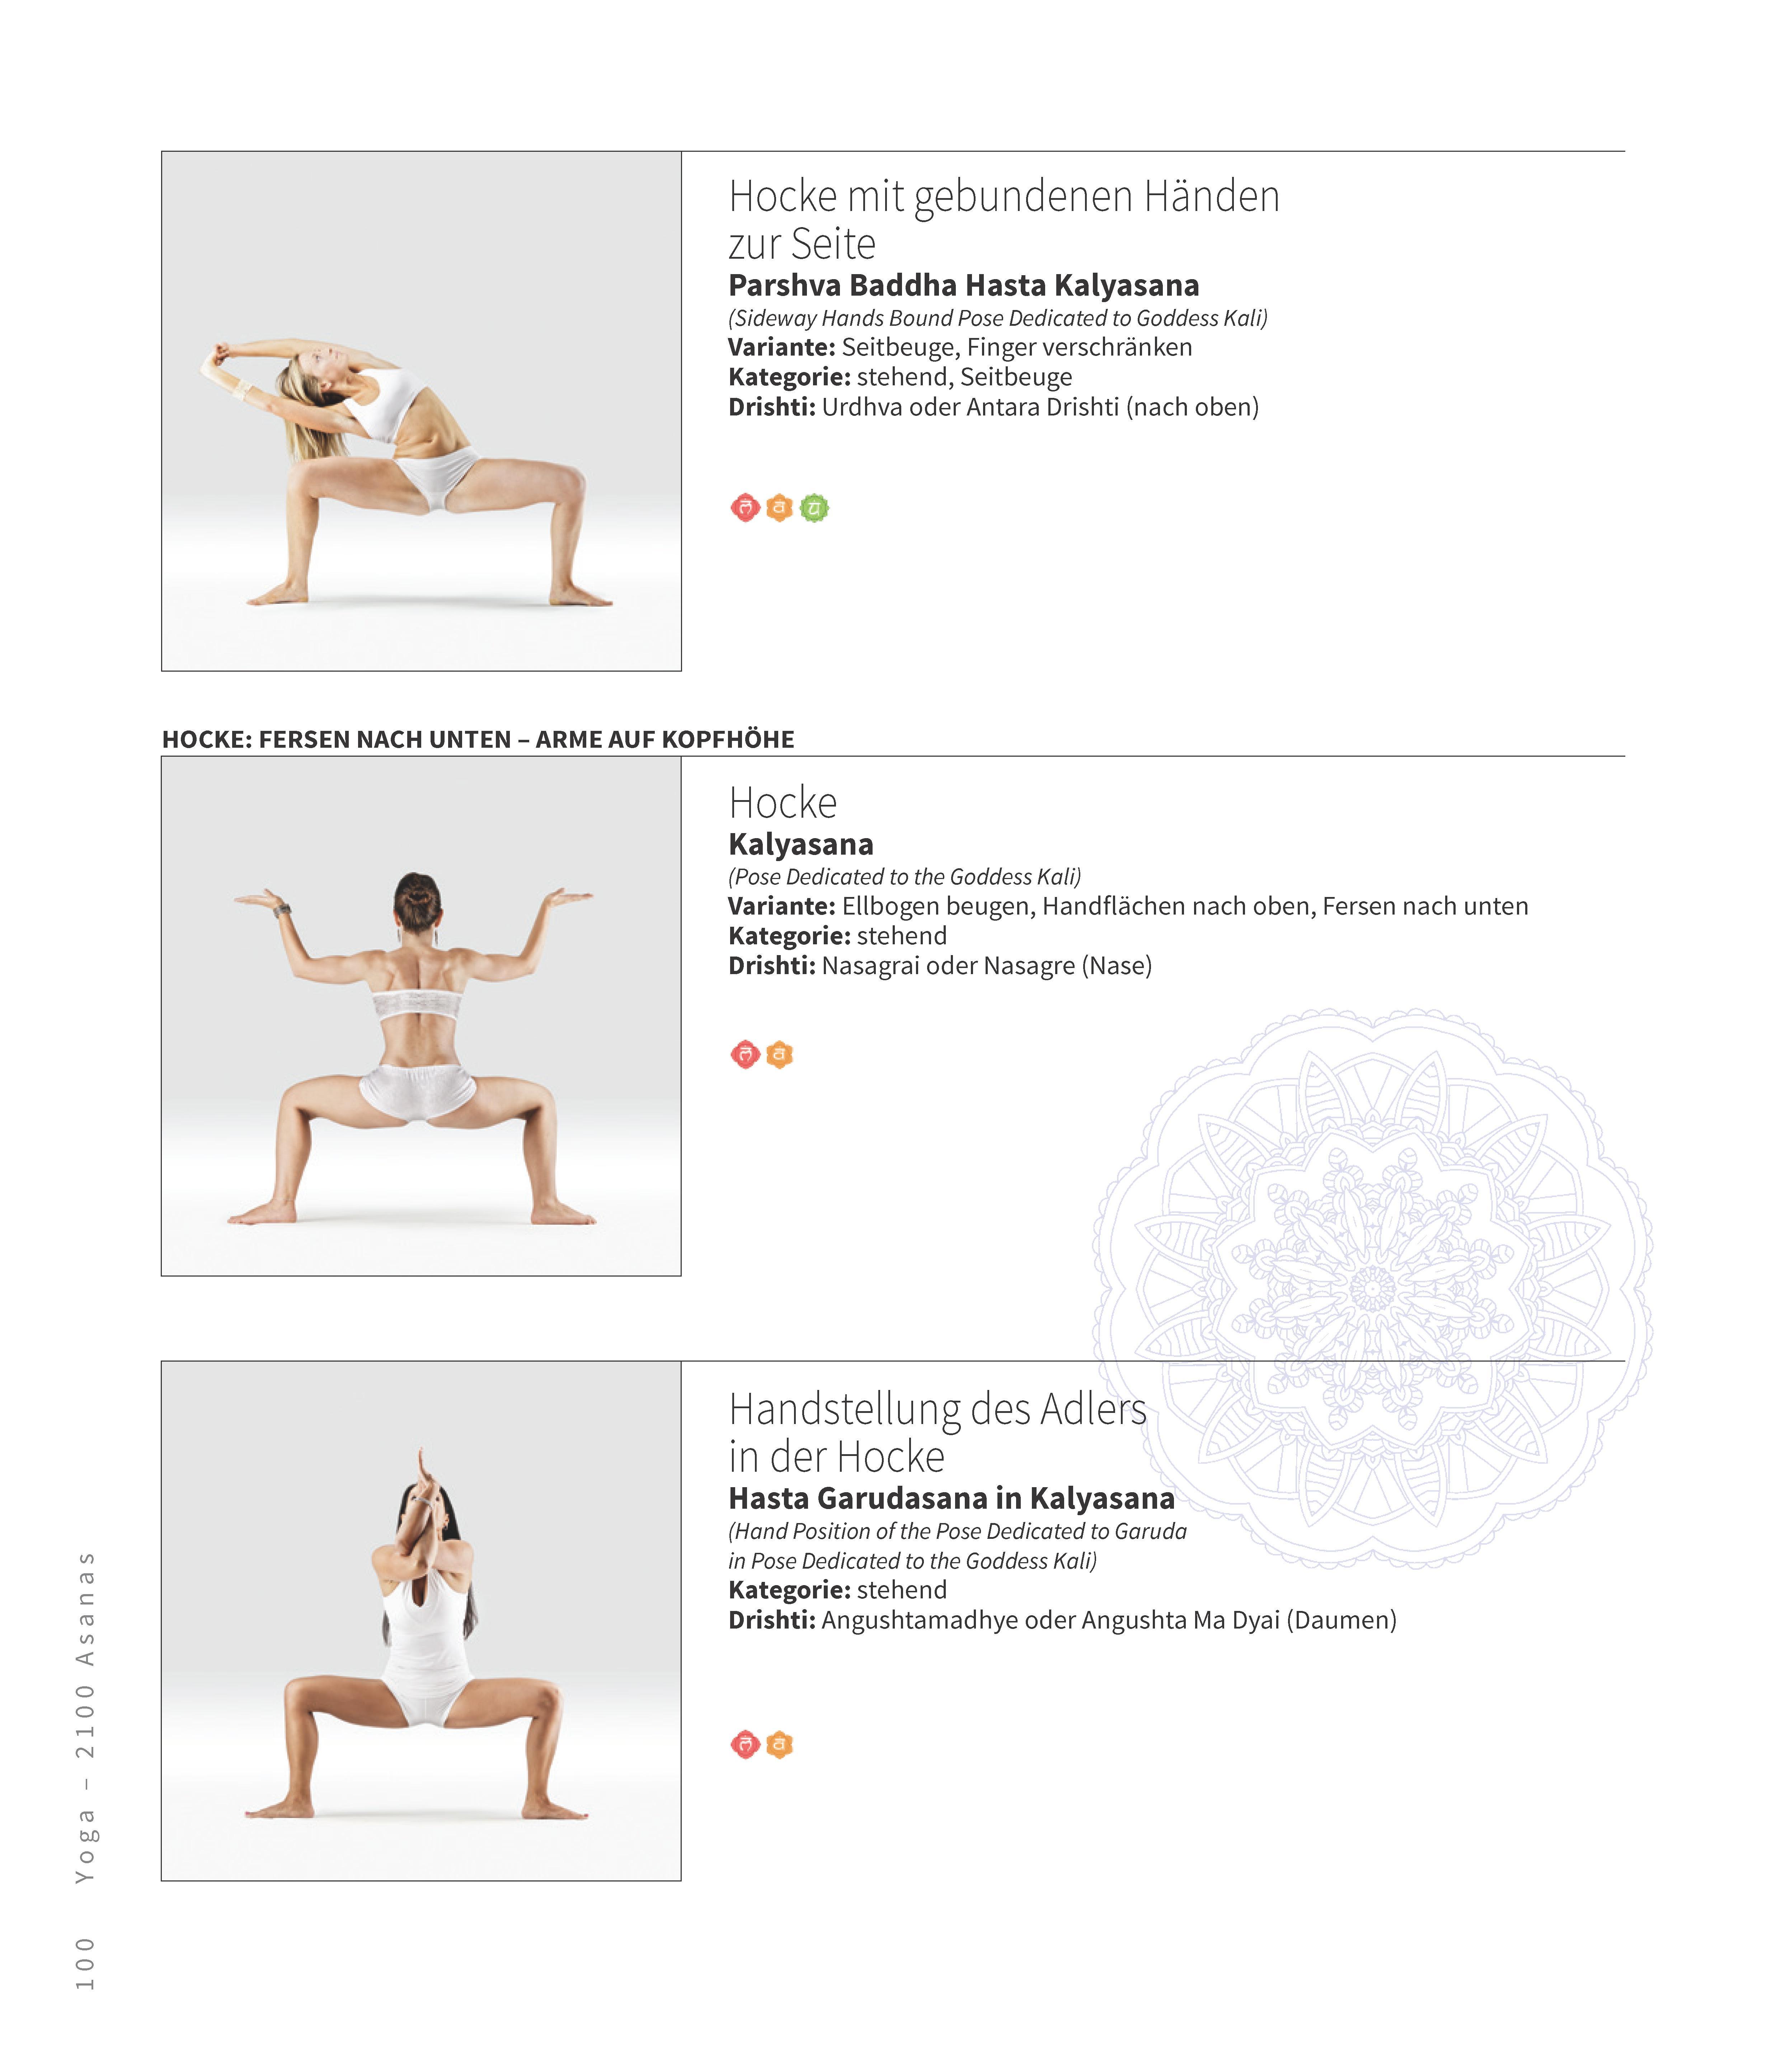 2100 asanas the complete yoga poses pdf